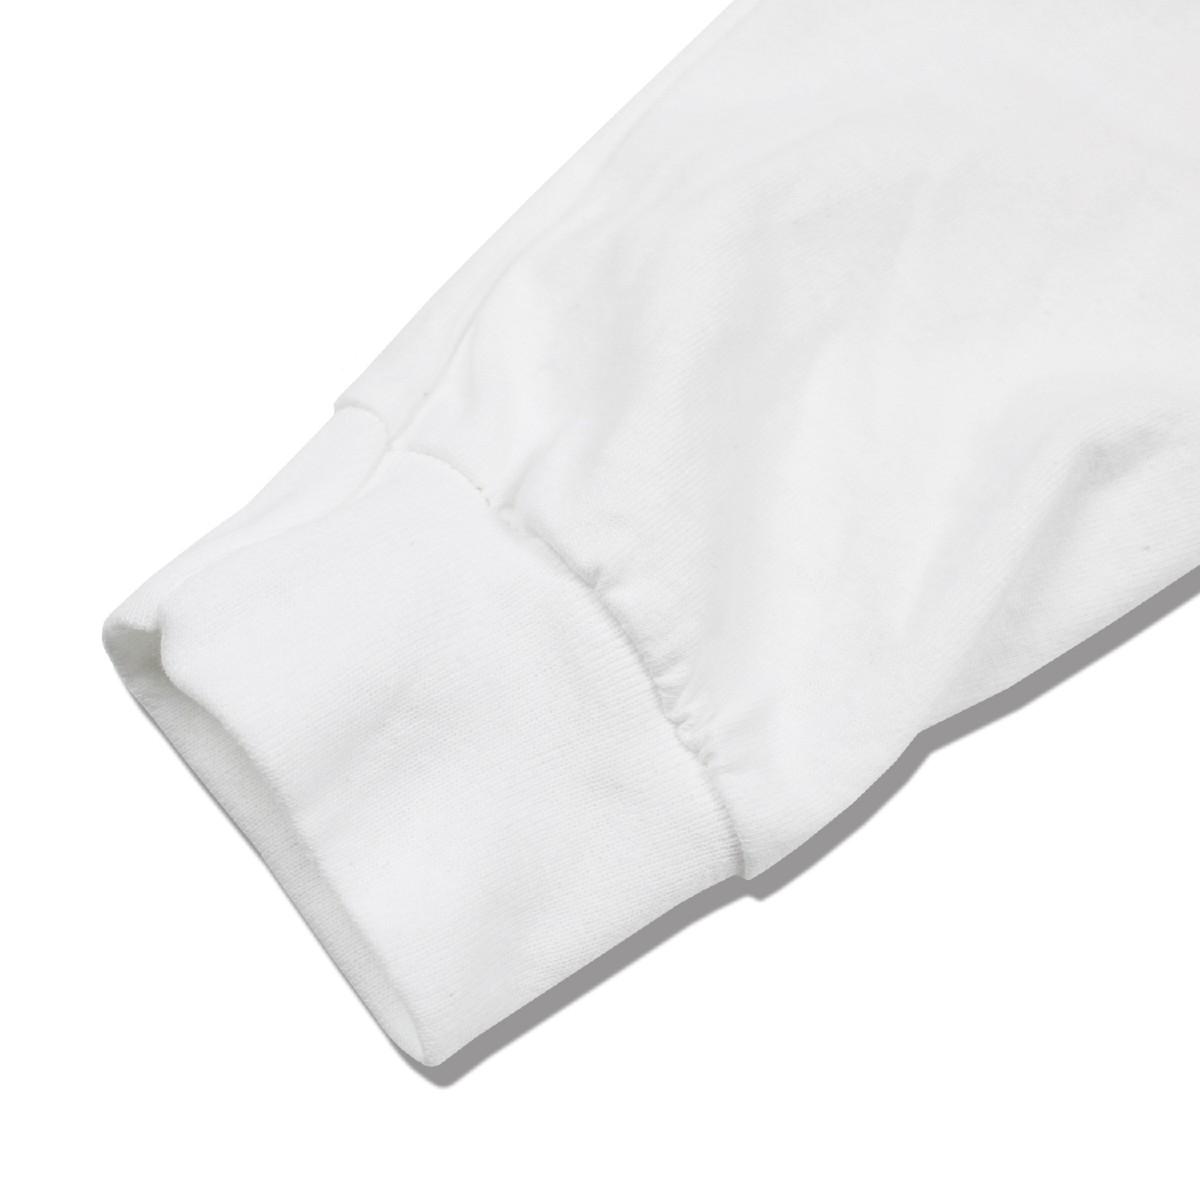 【50%OFF】Blueism ブルーイズム Yachtharbor Long Tee Shirt